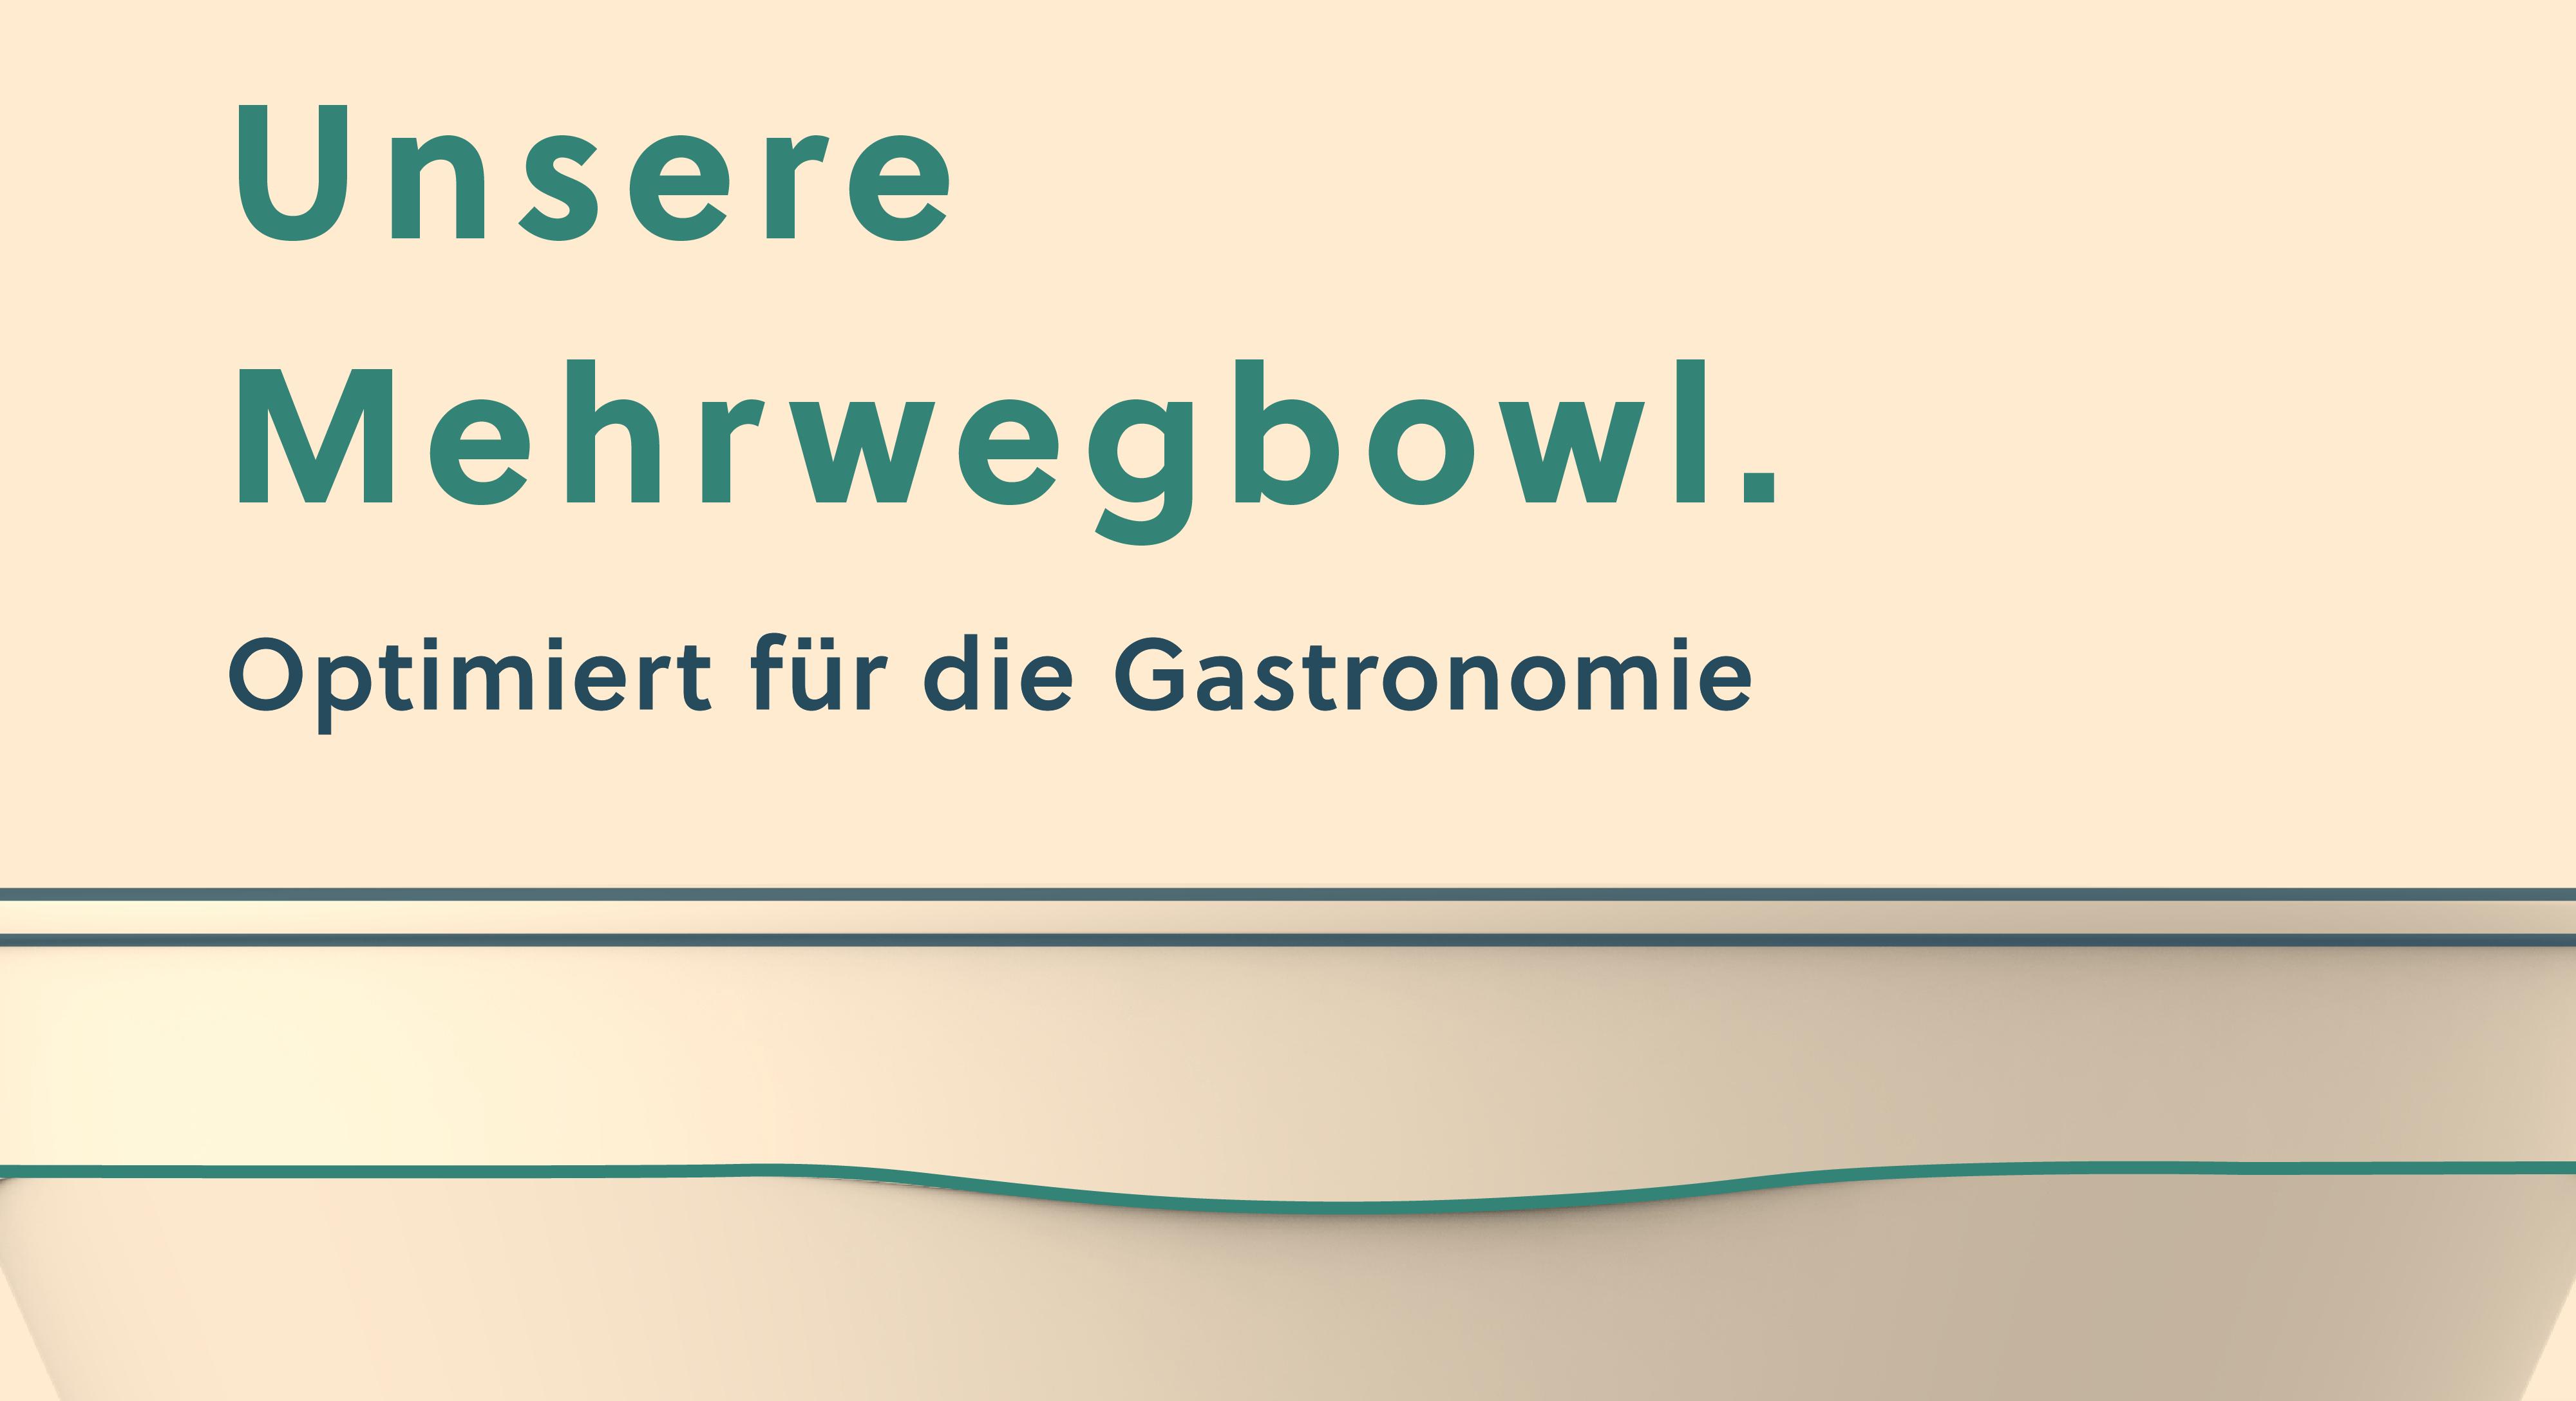 CF Mehrwegbowl - optimiert für die Gastronomie